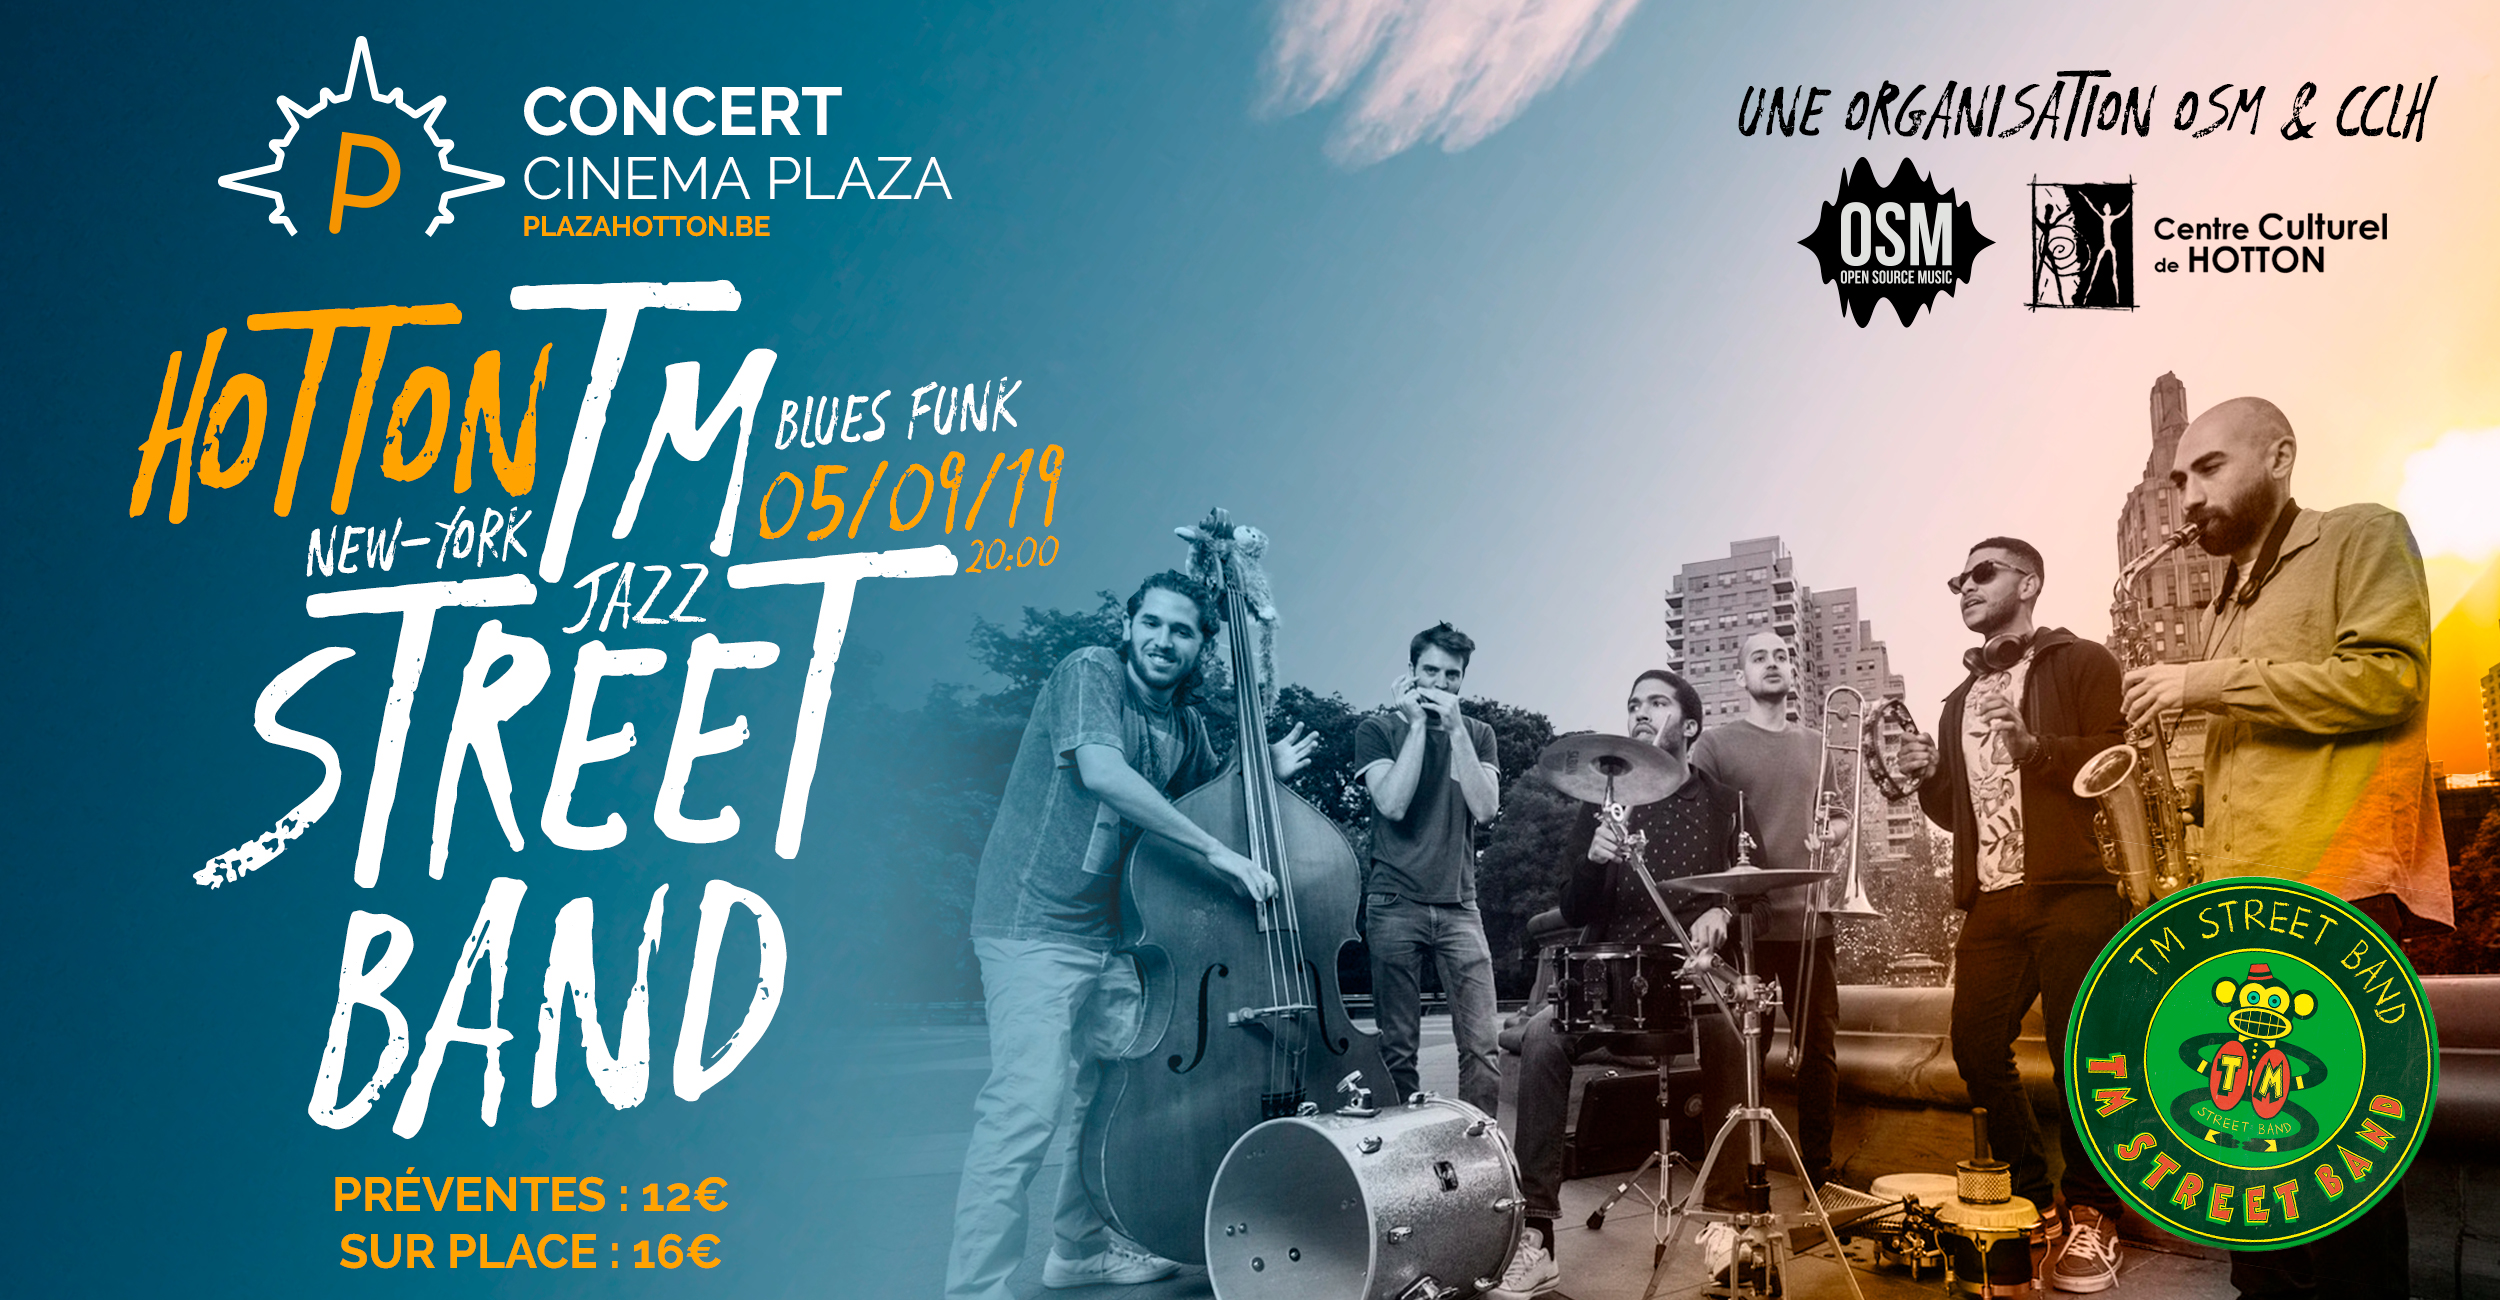 !CONCERT! <br> TM Street Band – New York Jazz Blues Funk Band